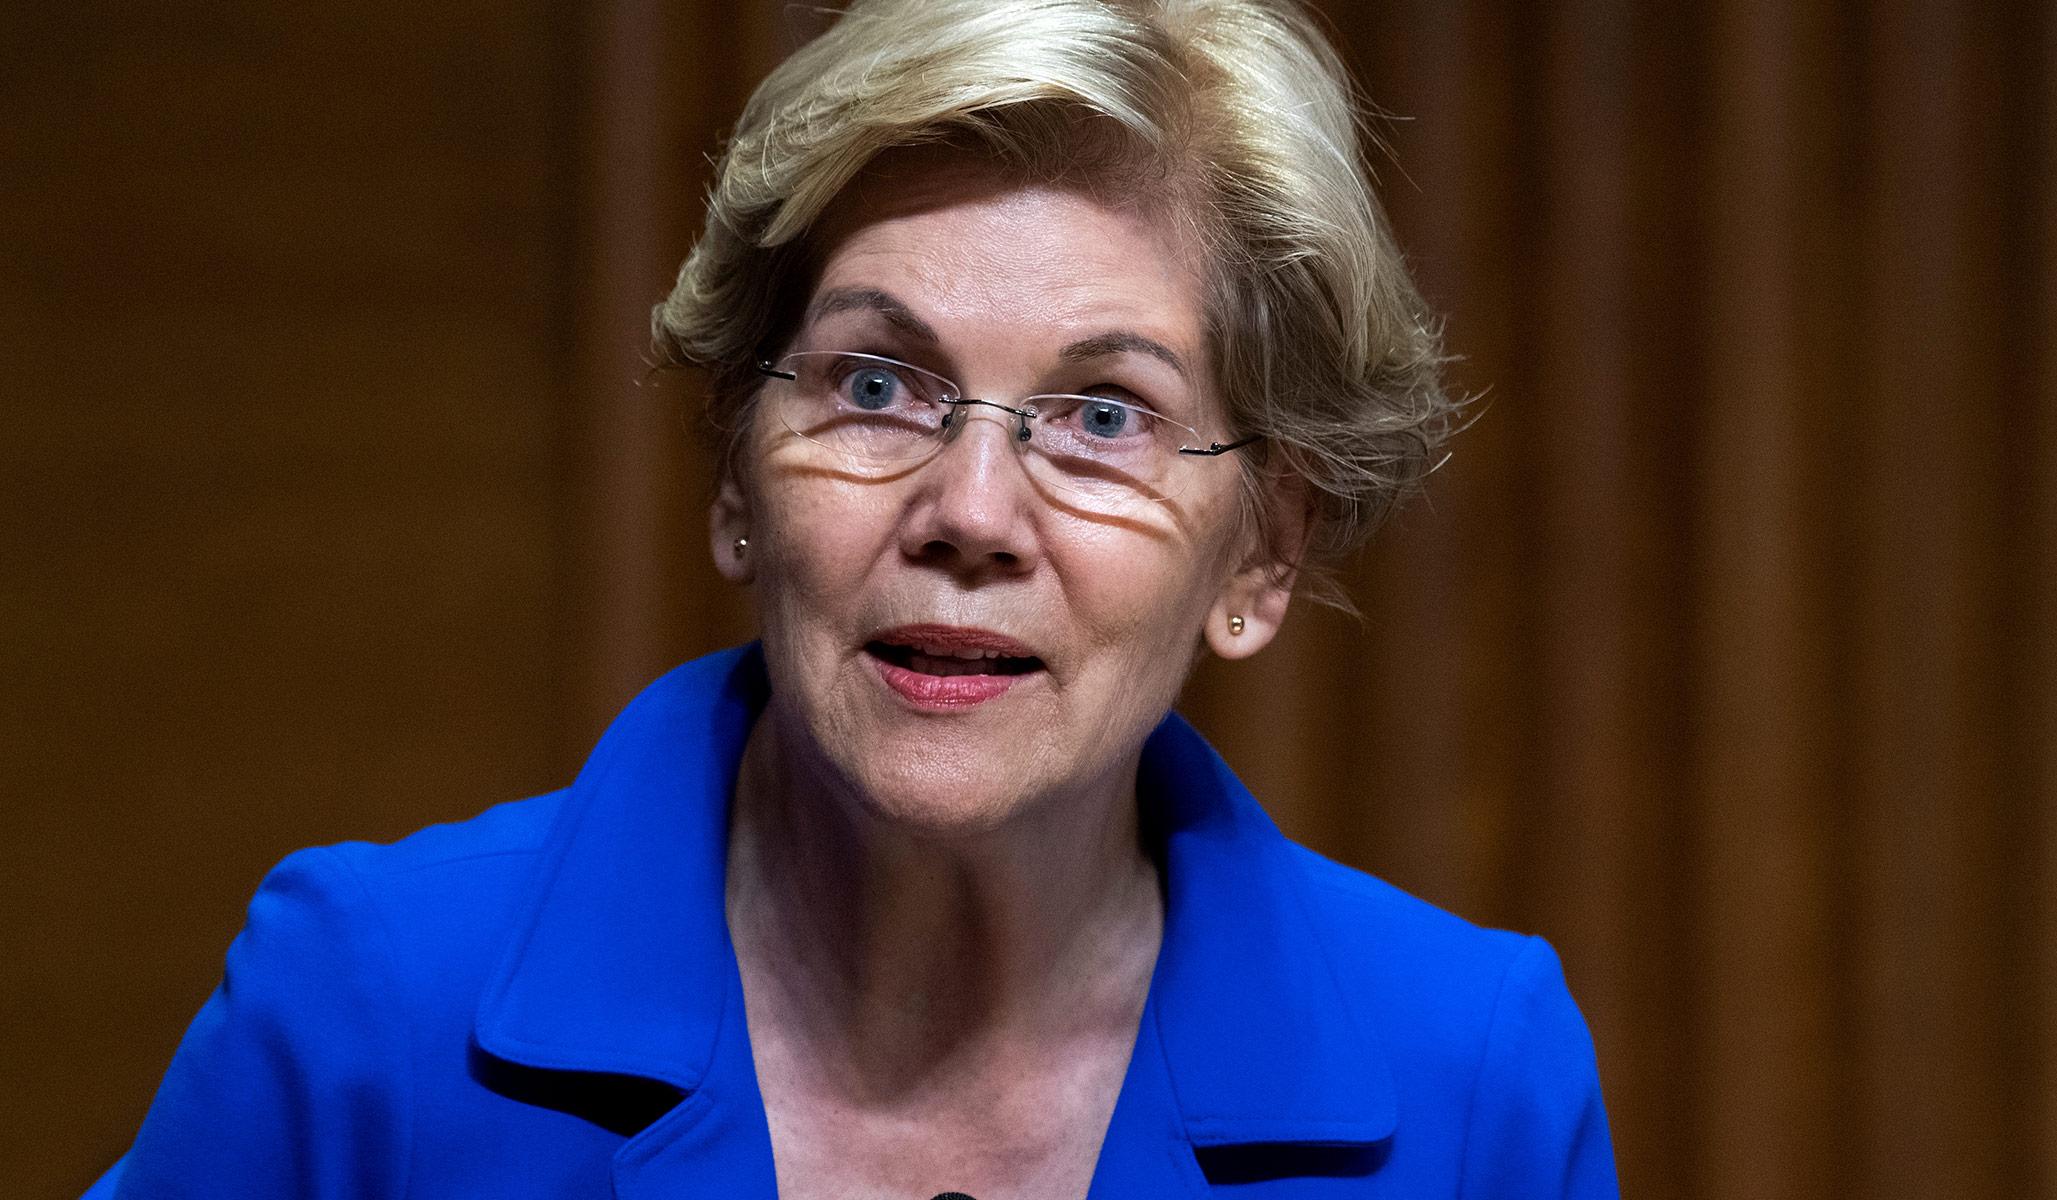 Senator Elizabeth Warren at a Senate Finance Committee hearing in Washington, D.C.